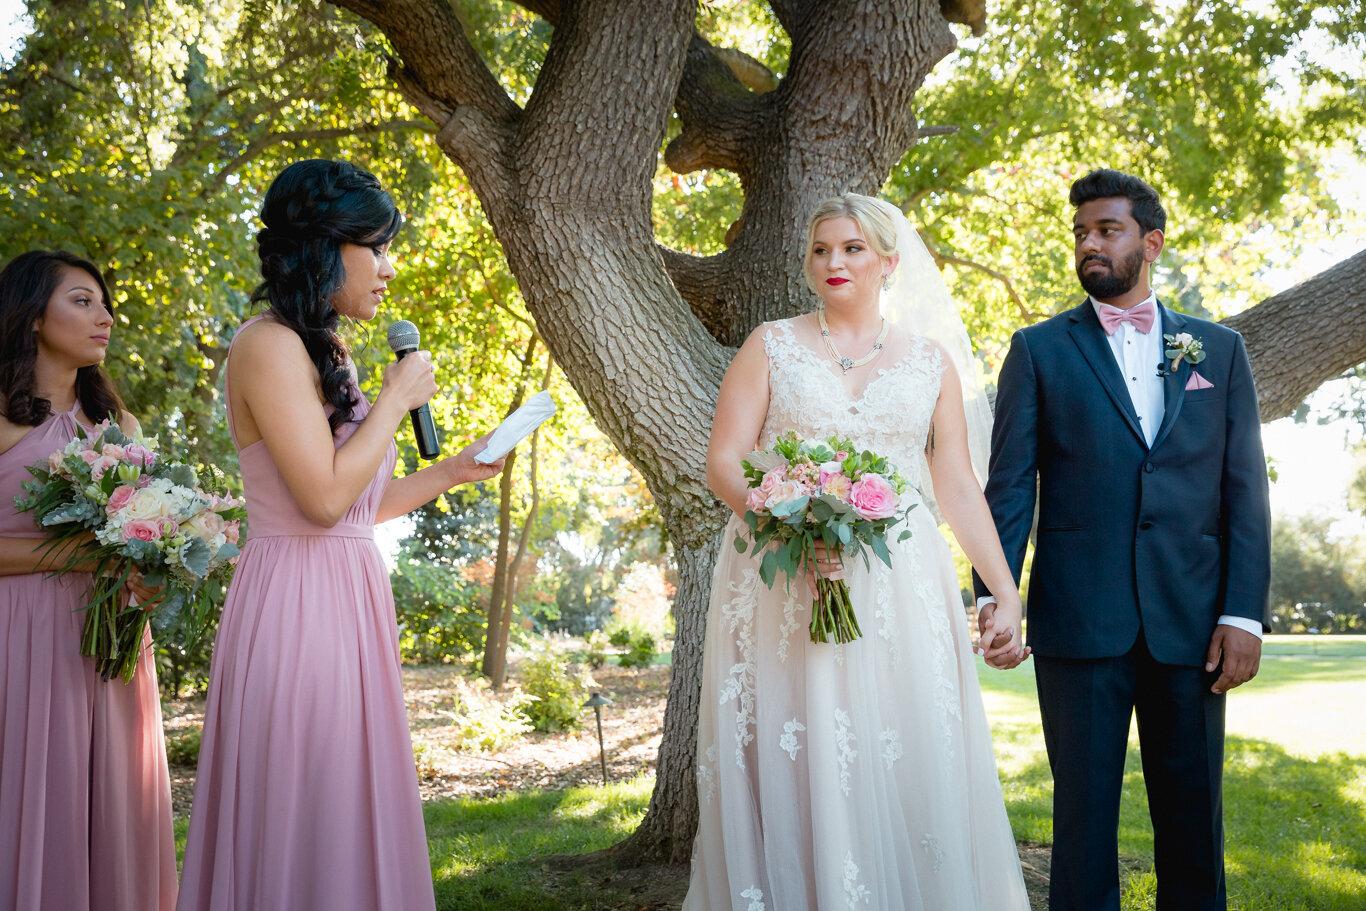 2019.08.24_Emily-Ashir-Wedding-at-the-Maples-5838.jpg